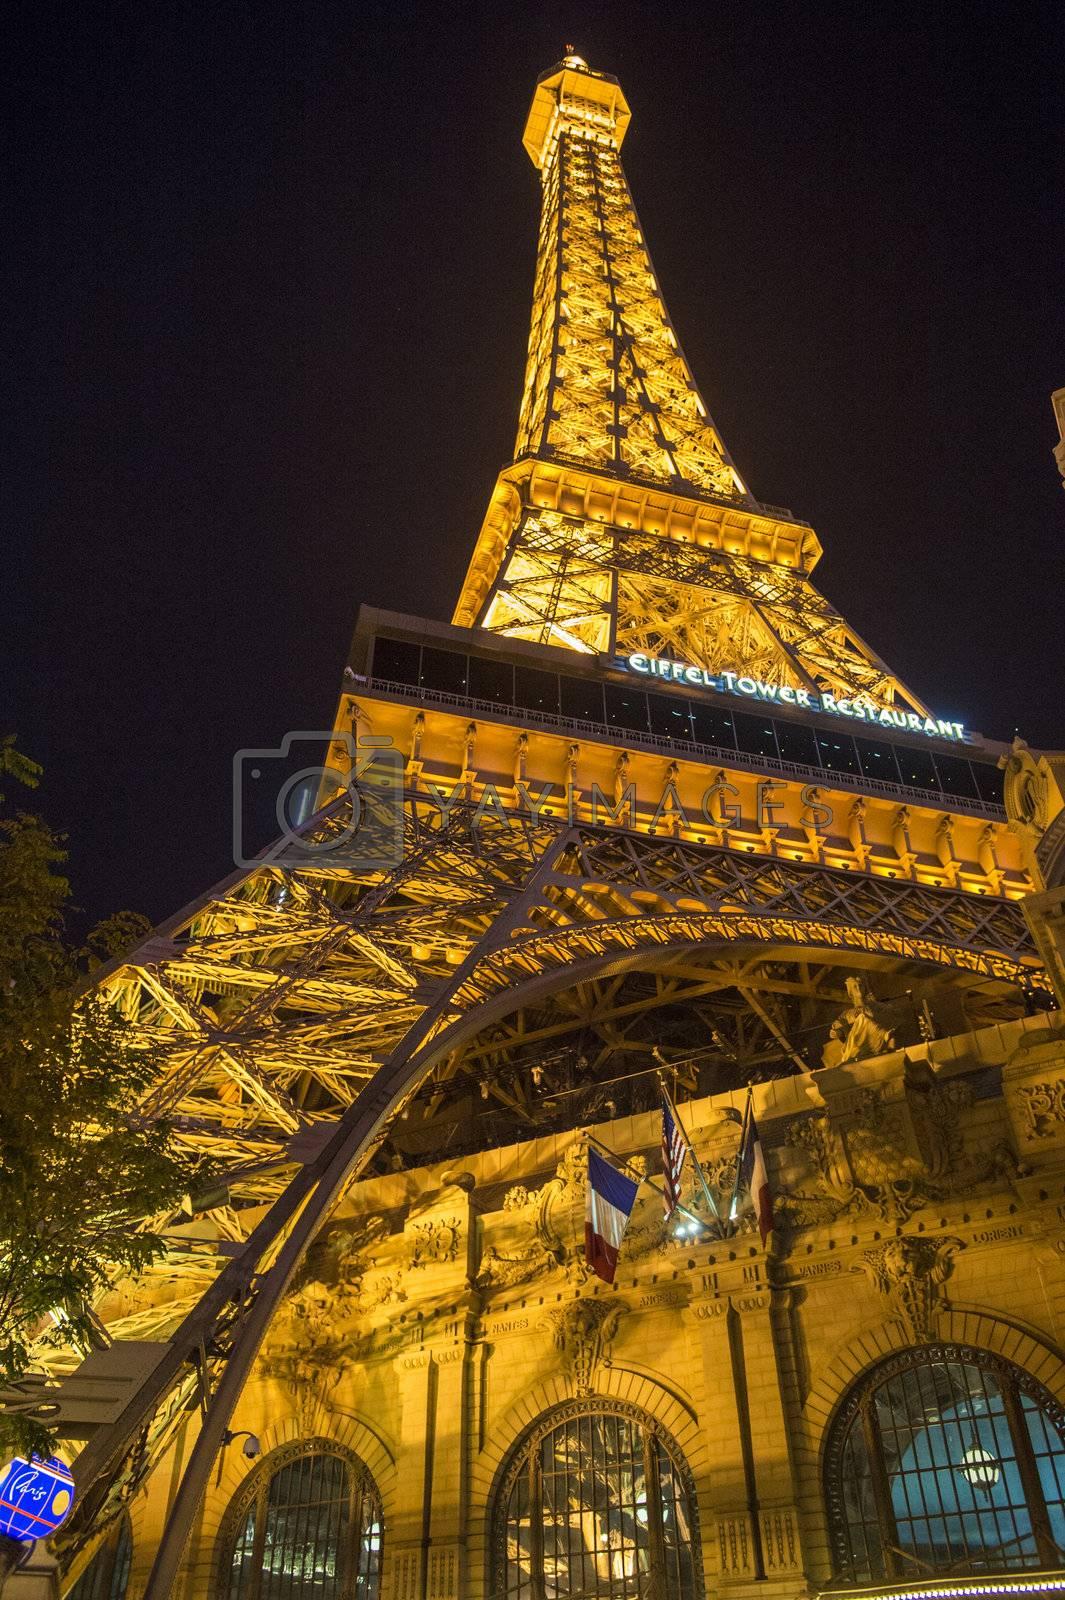 LAS VEGAS - NOVEMBER 08: The Paris Las Vegas hotel and casino on November 08, 2012 in Las Vegas. Las Vegas in 2012 is projected to break the all-time visitor volume record of 39-plus million visitors